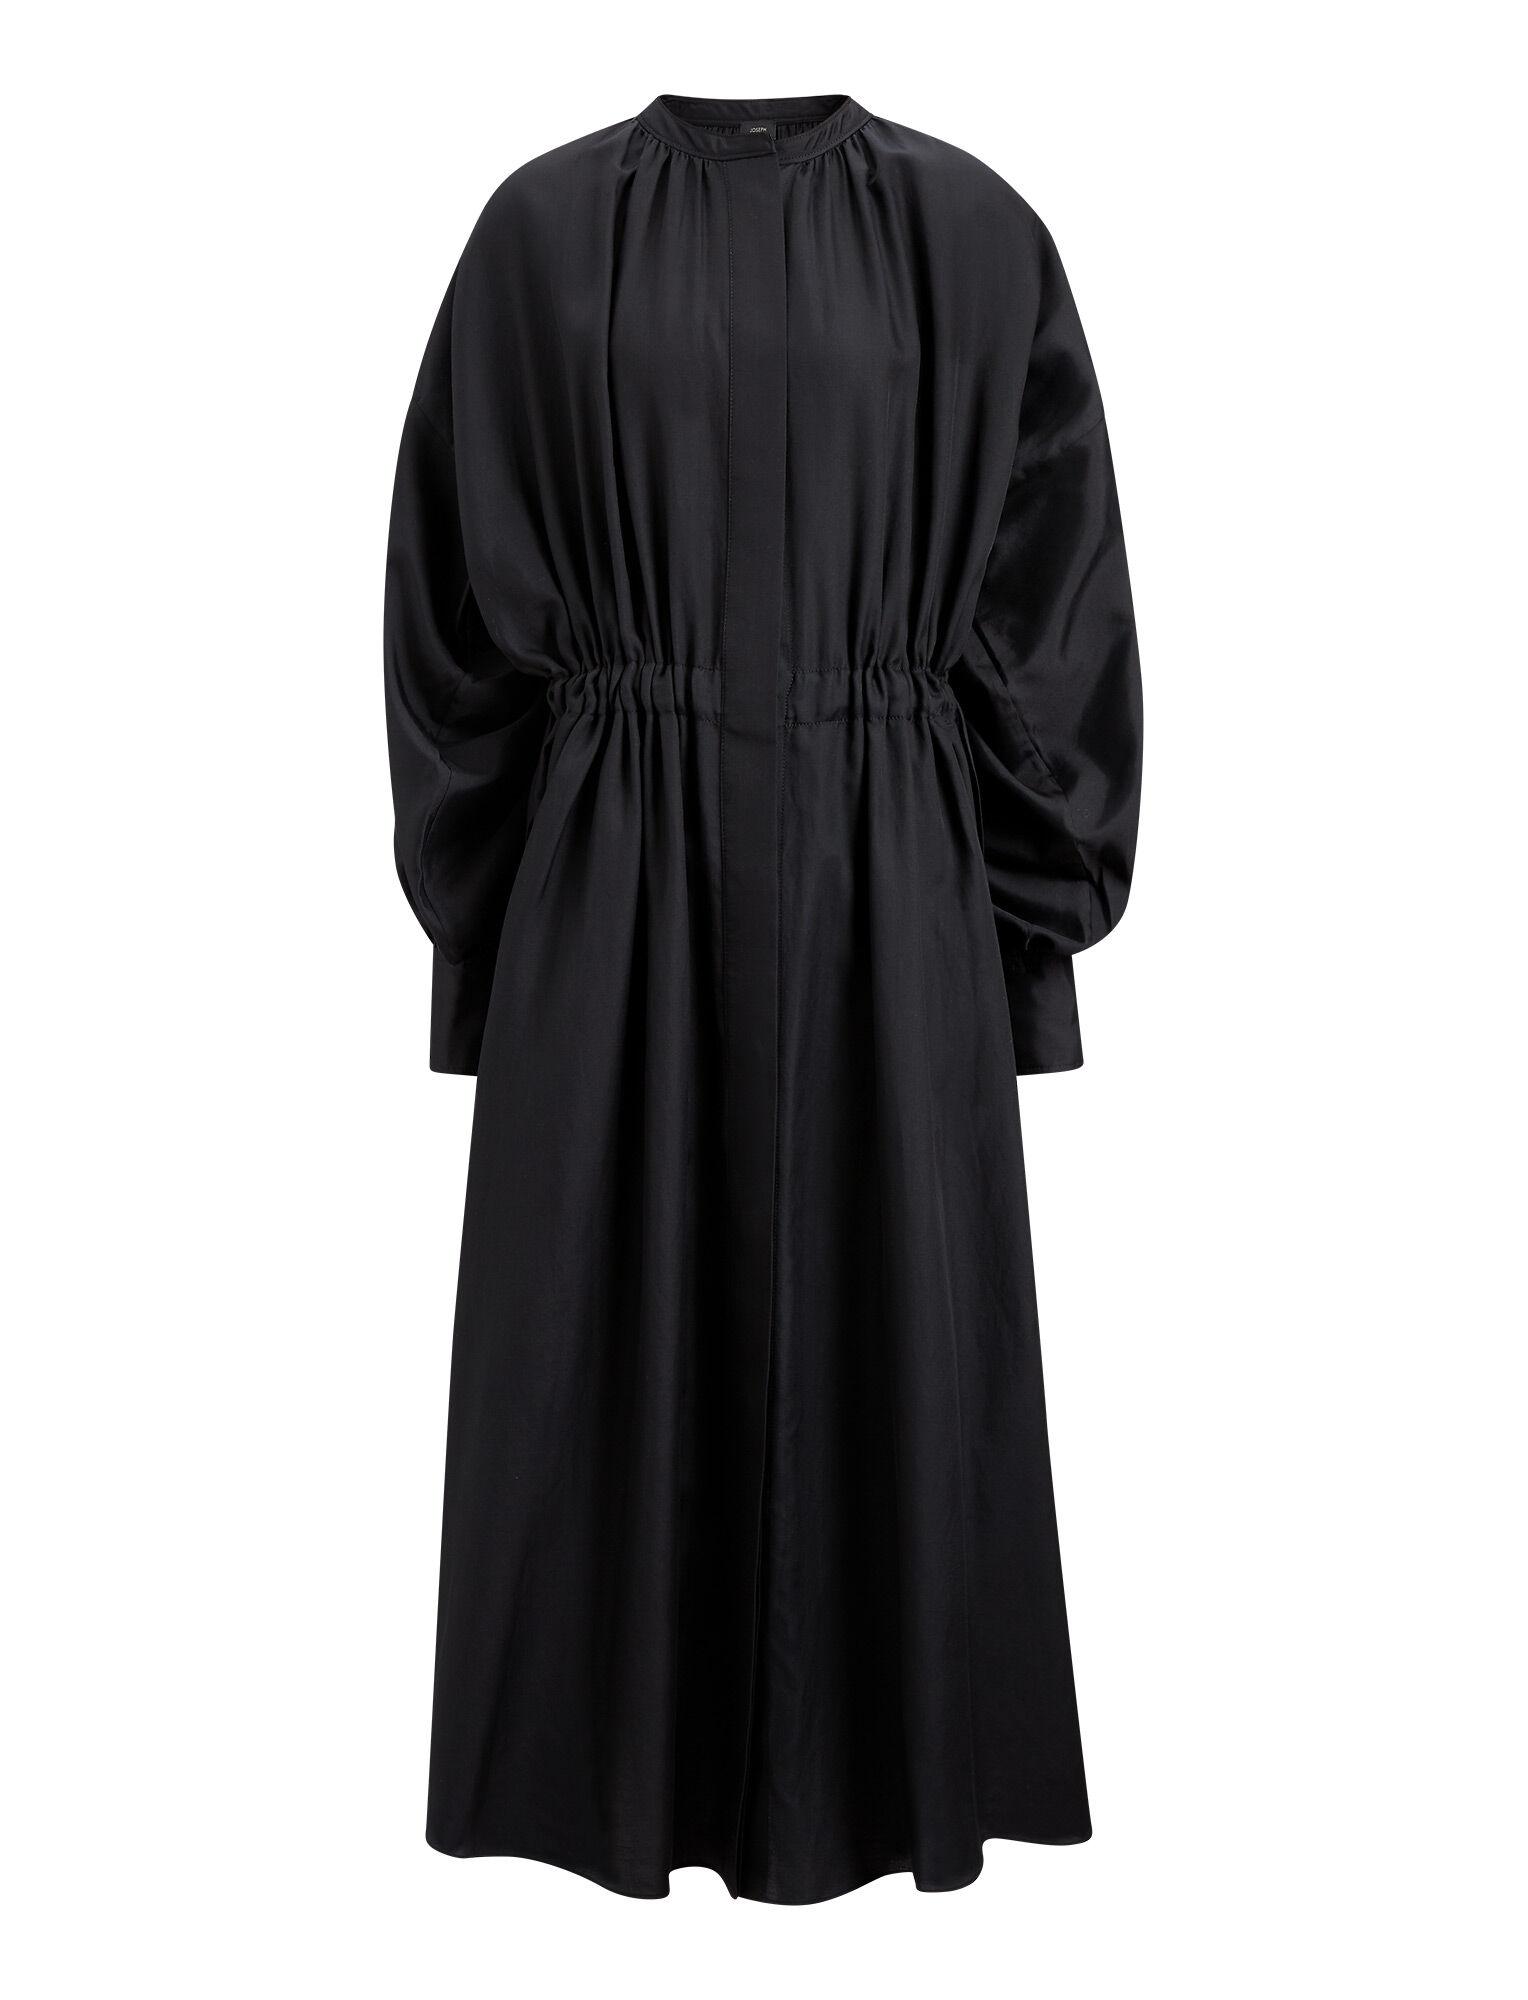 456635a036f0 Joseph, Rafael Cotton Silk Shirting Dress, in BLACK ...